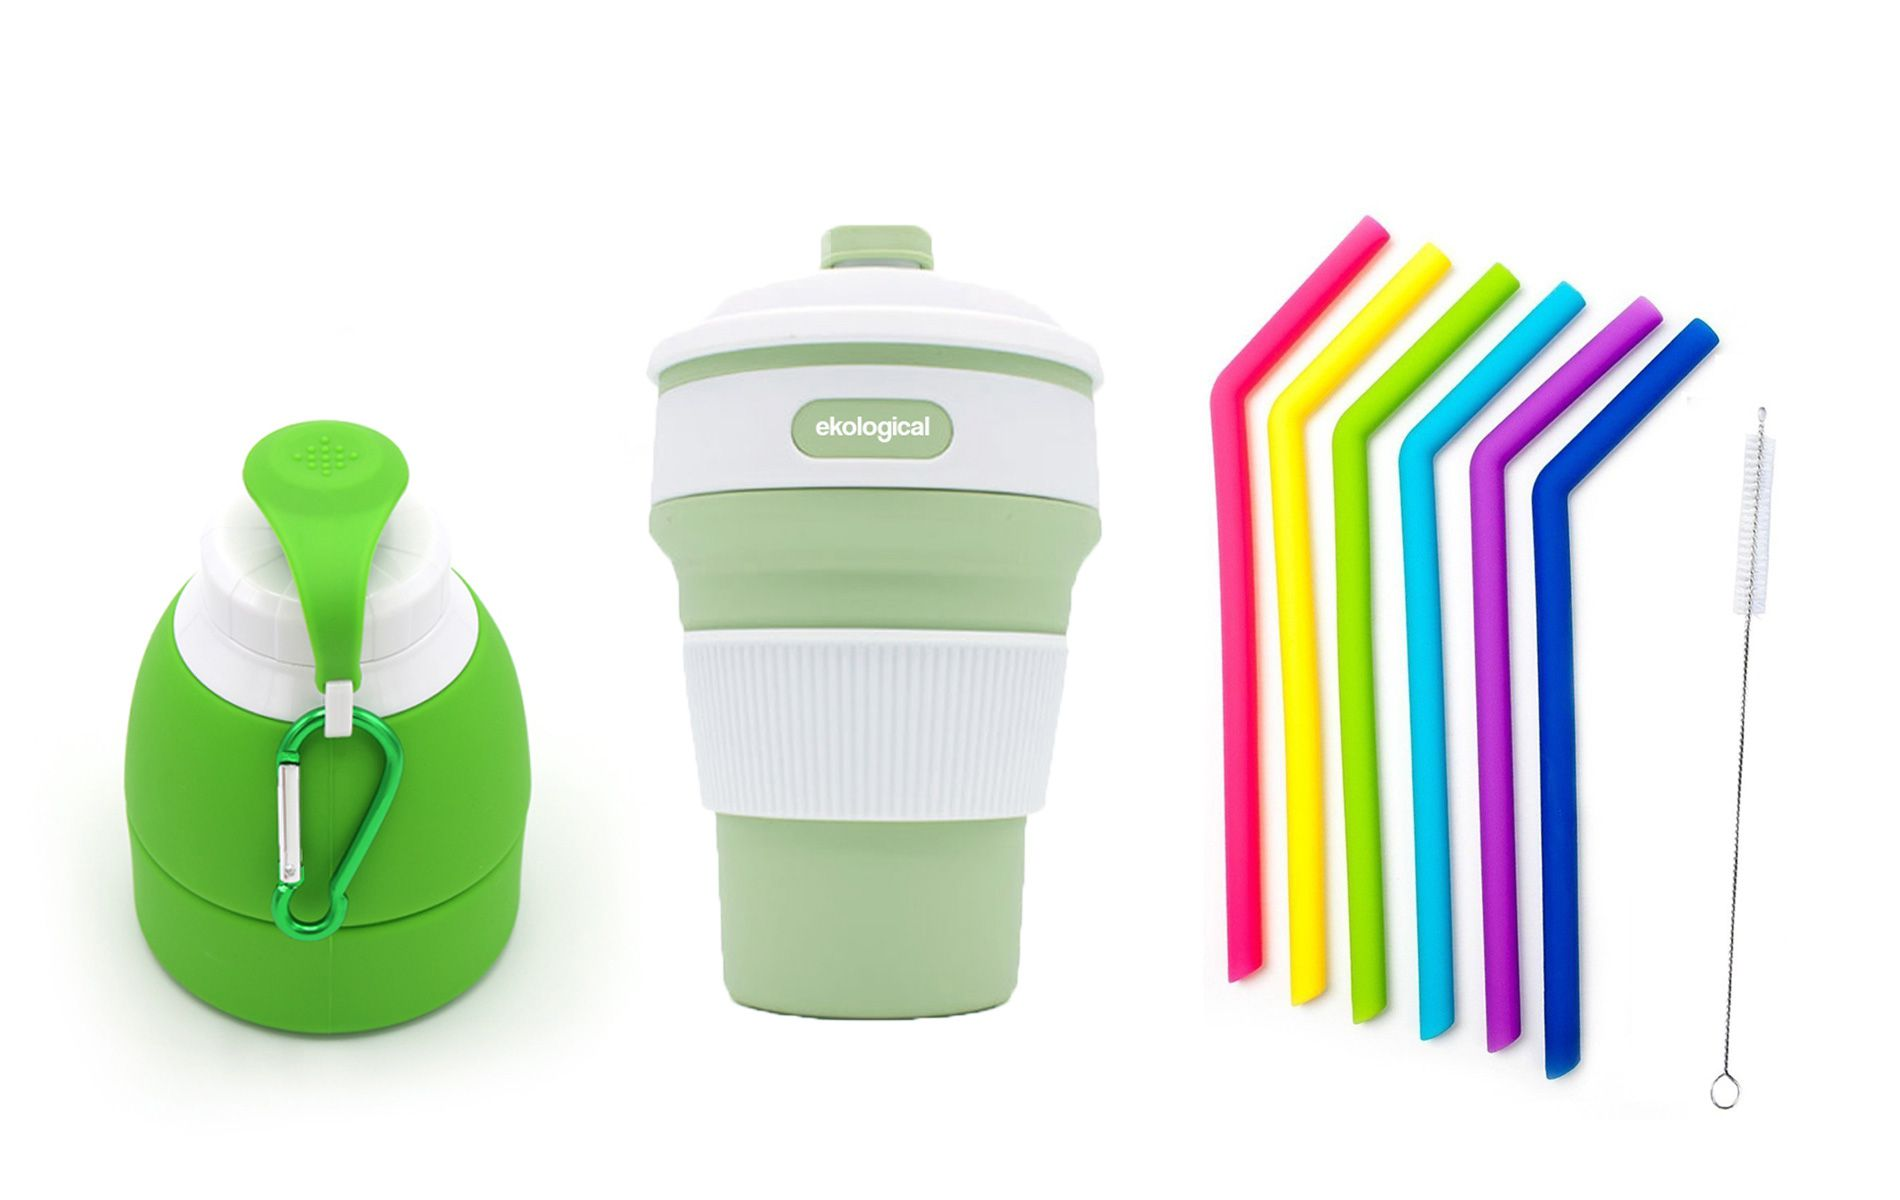 Garrafa , Copo de 350ml e 6 Canudos Reutilizáveis de Silicone | Eko Kit 12